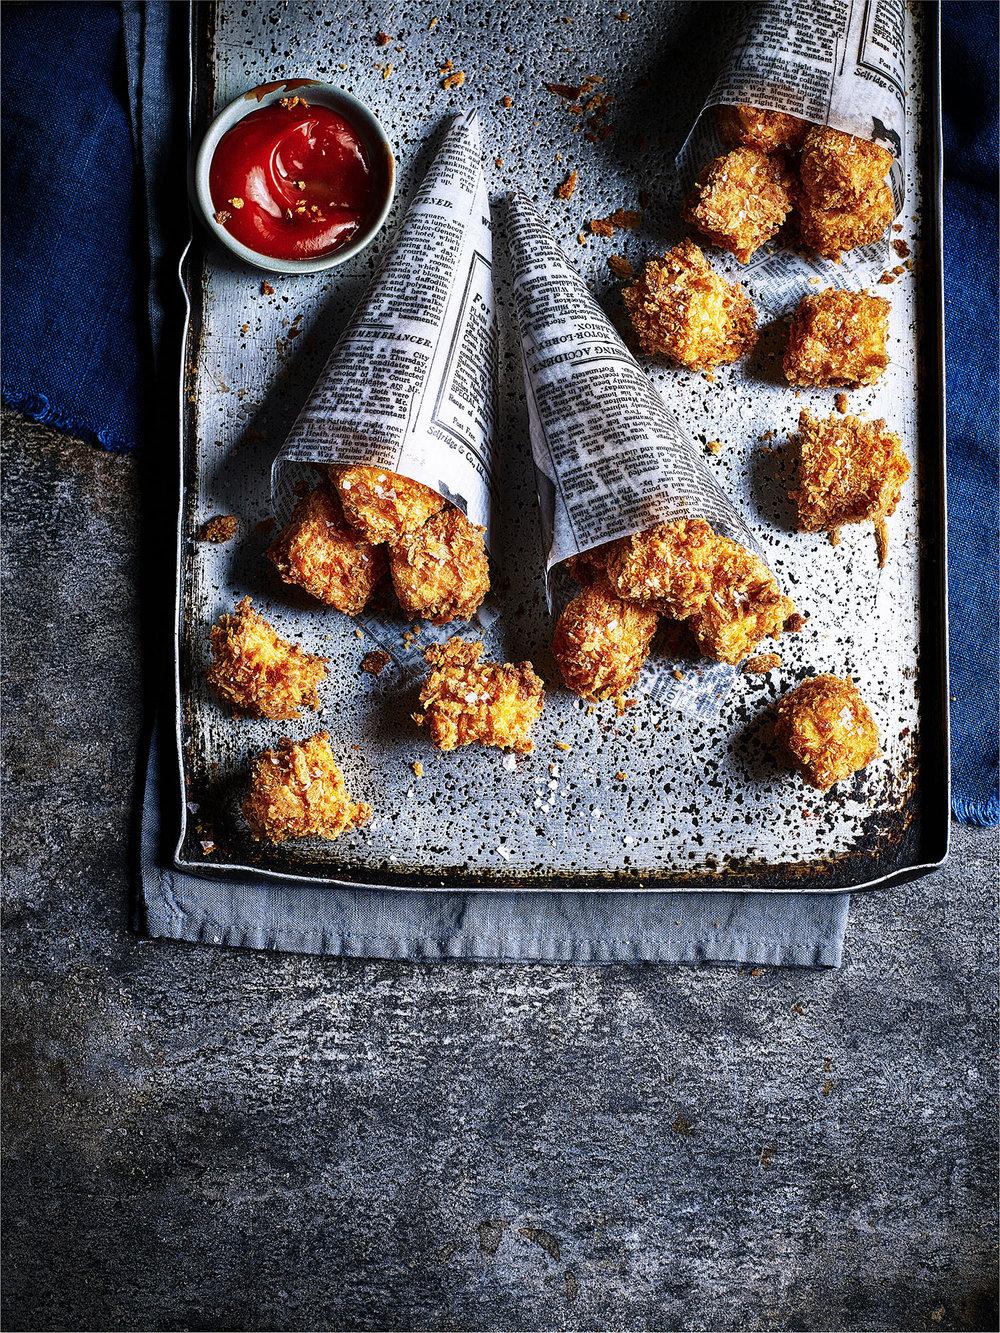 Vegan 'chicken' nuggets Photograph Kris Kirkham Prop Styling Davina Perkins Recipe Jenna Leiter